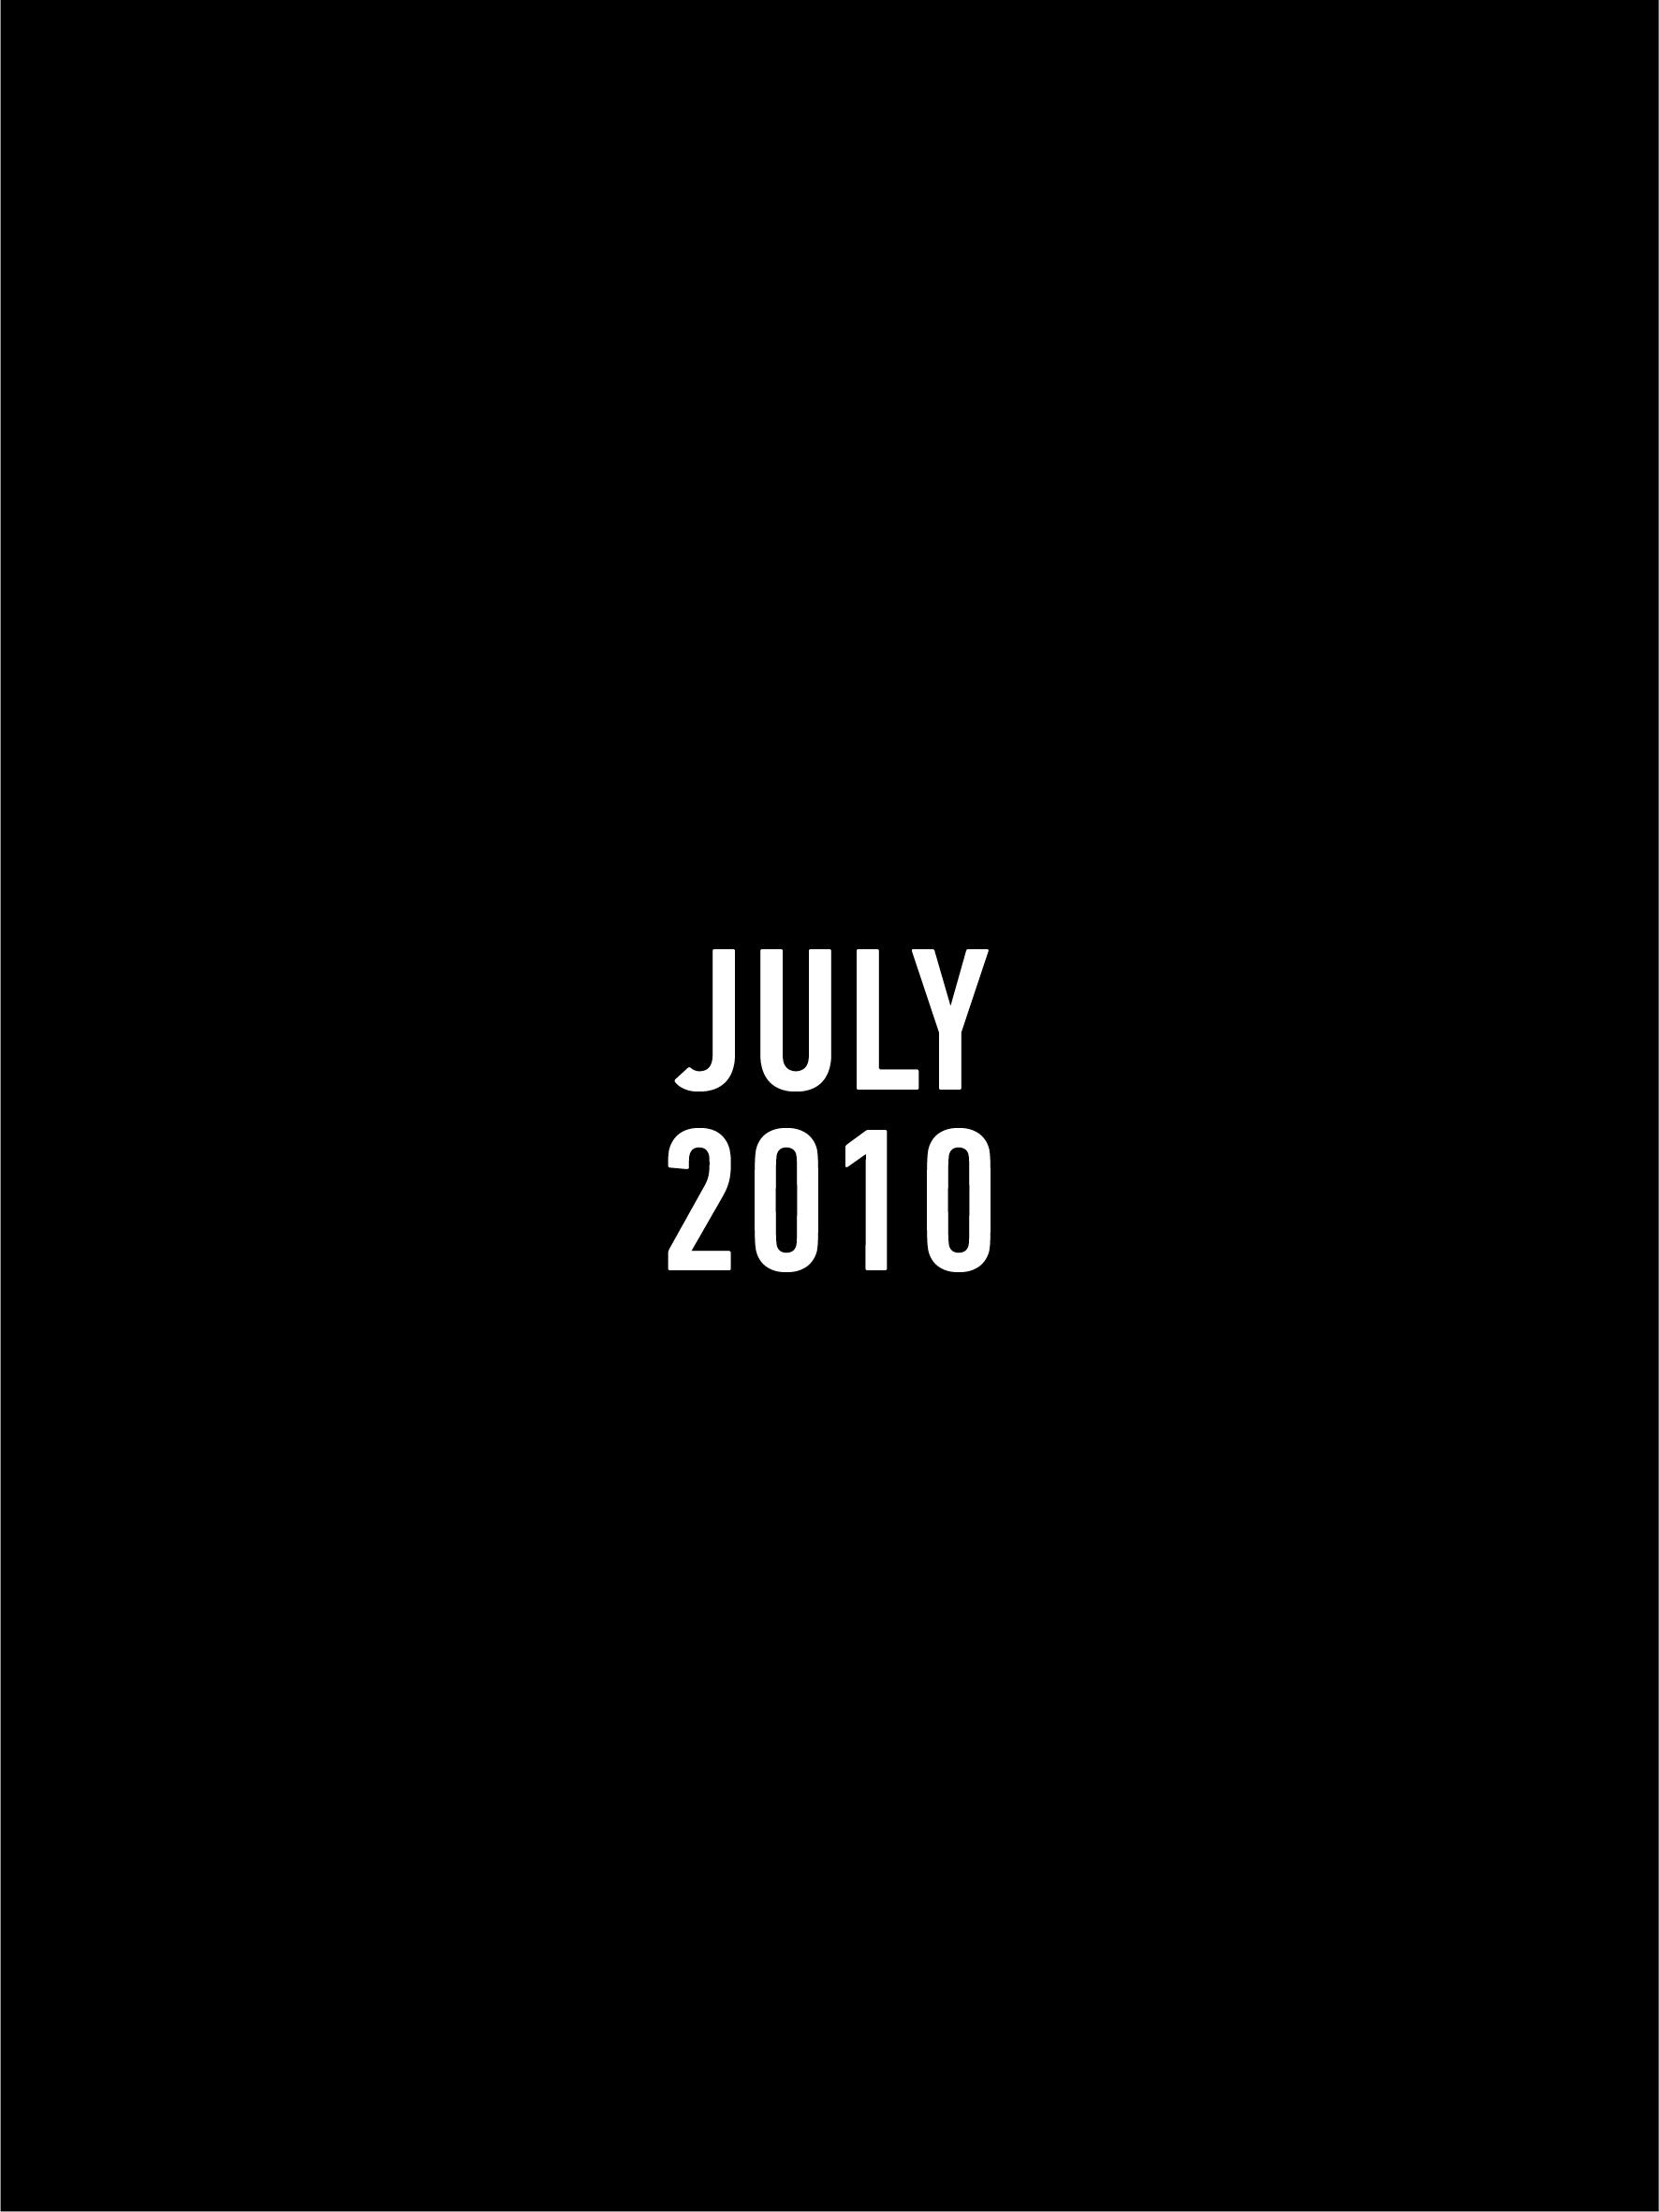 2010 monthly7.jpg